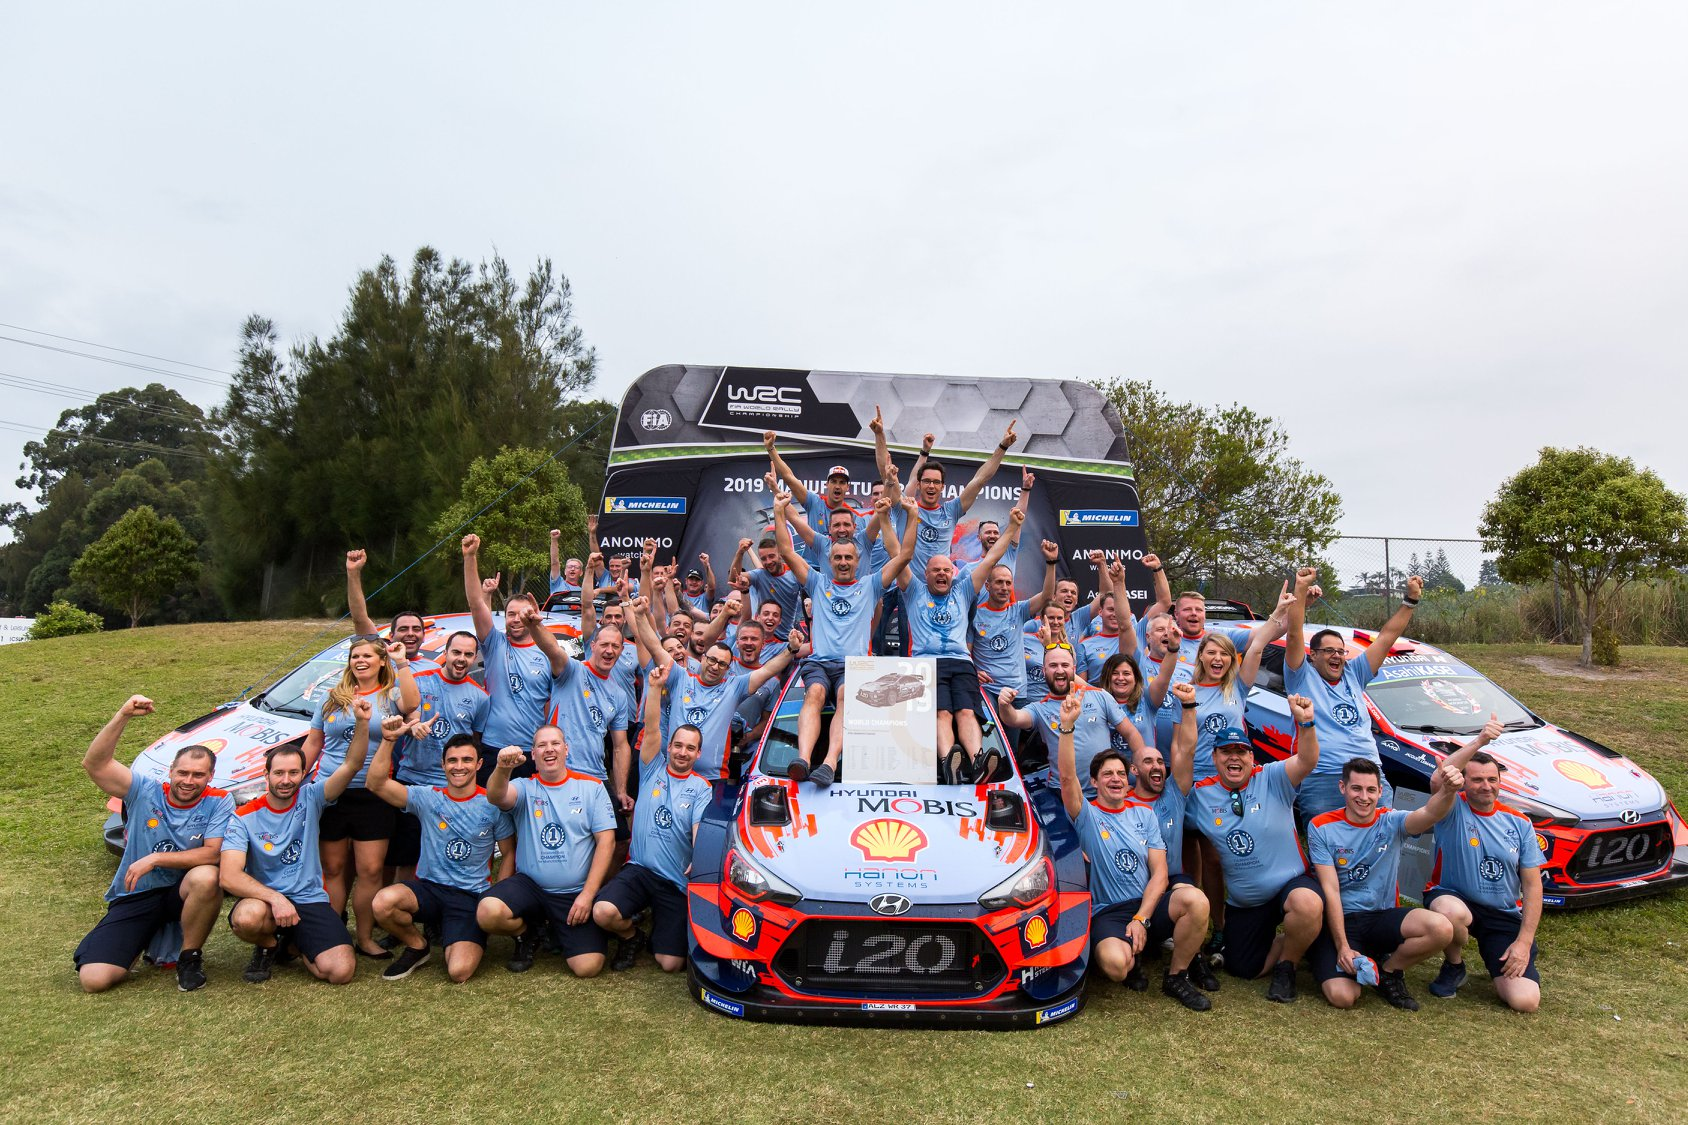 Echipa satelit pentru Hyundai in WRC?